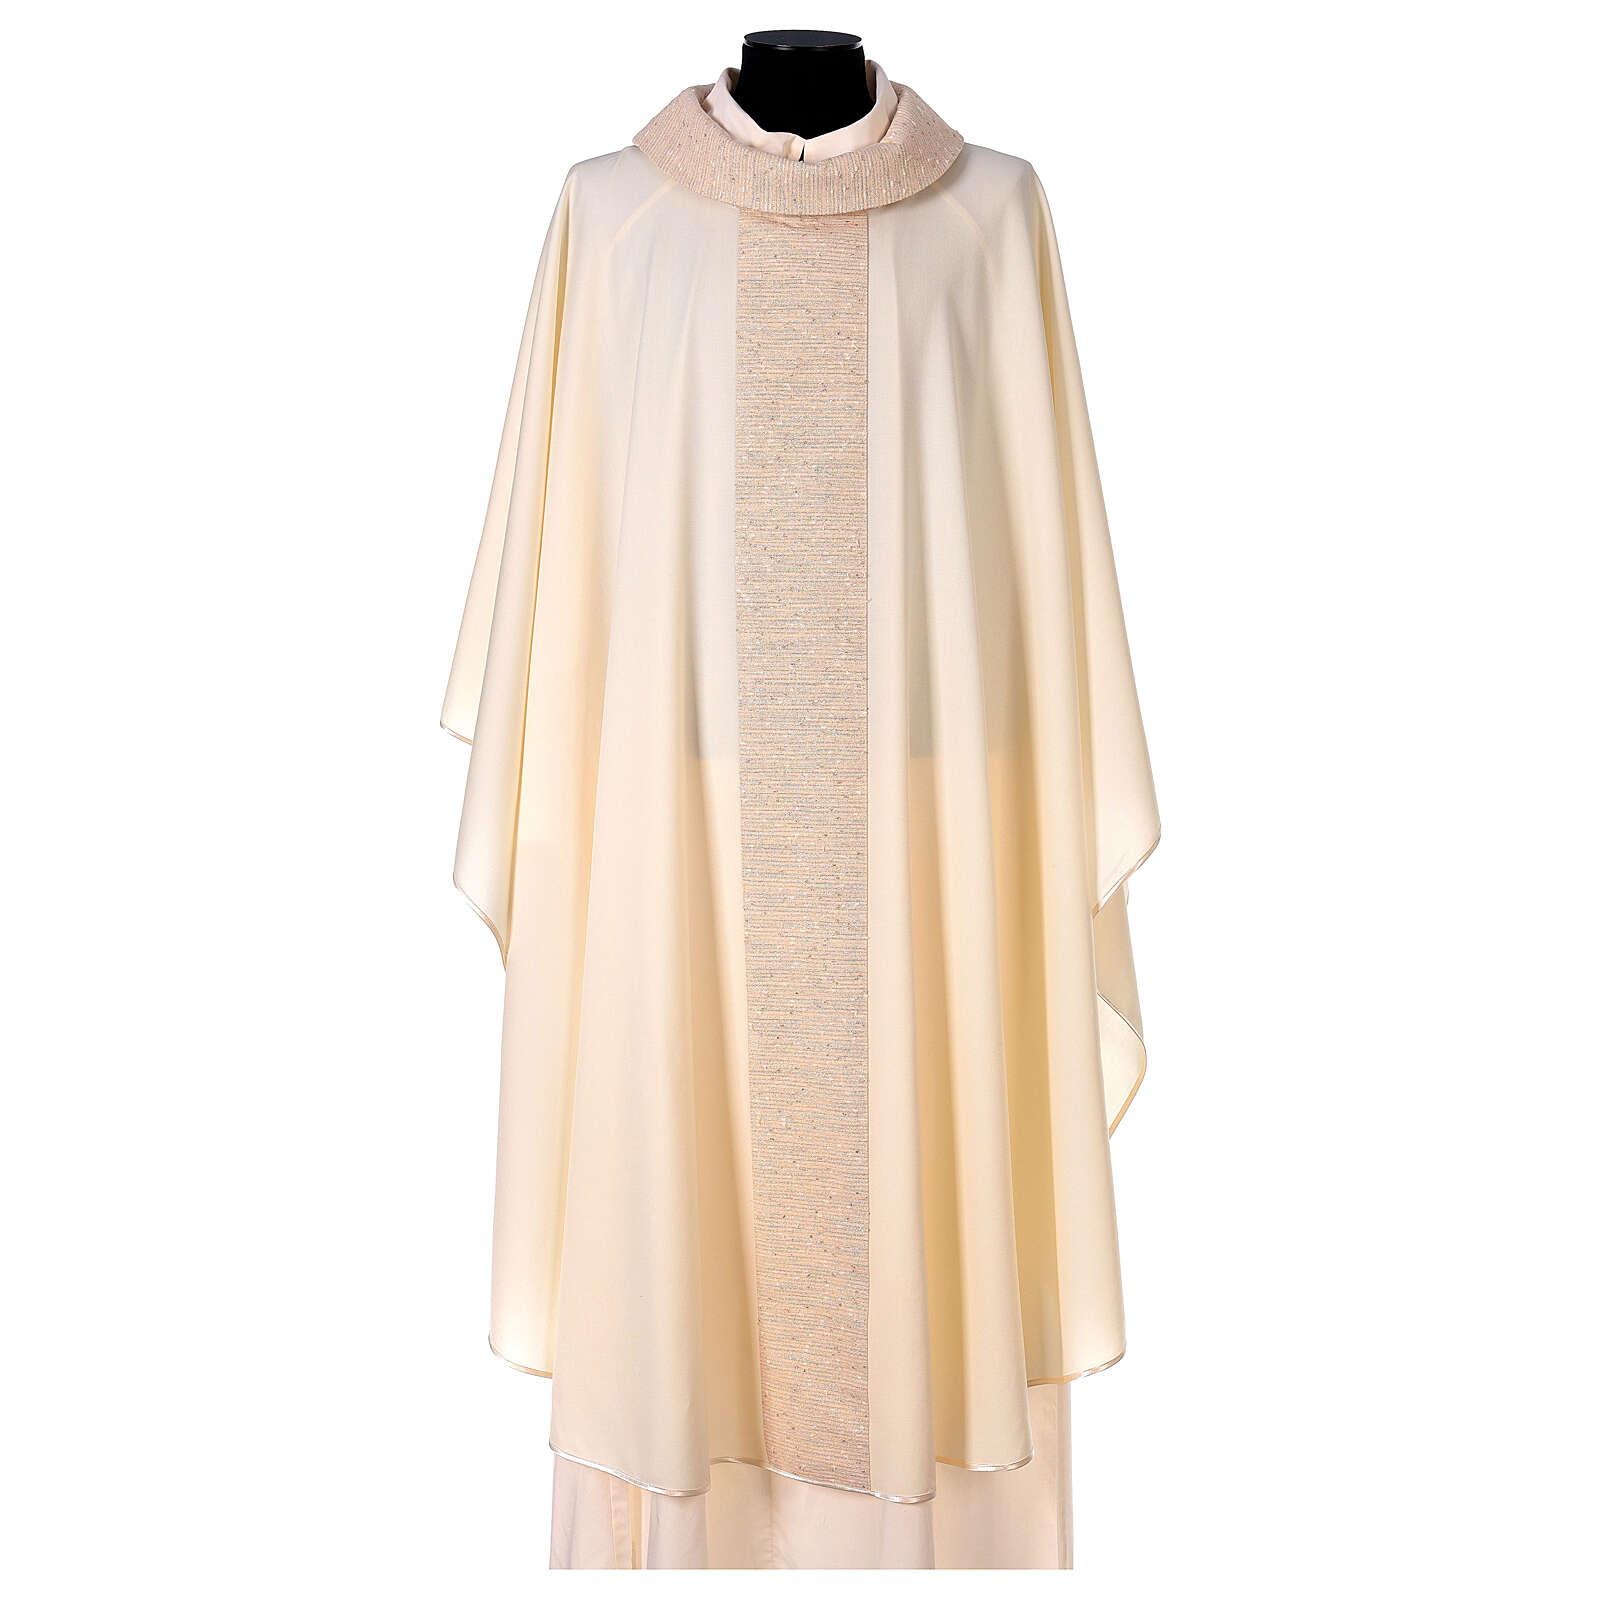 Casula 100% pura lana con riporto 100% pura seta 4